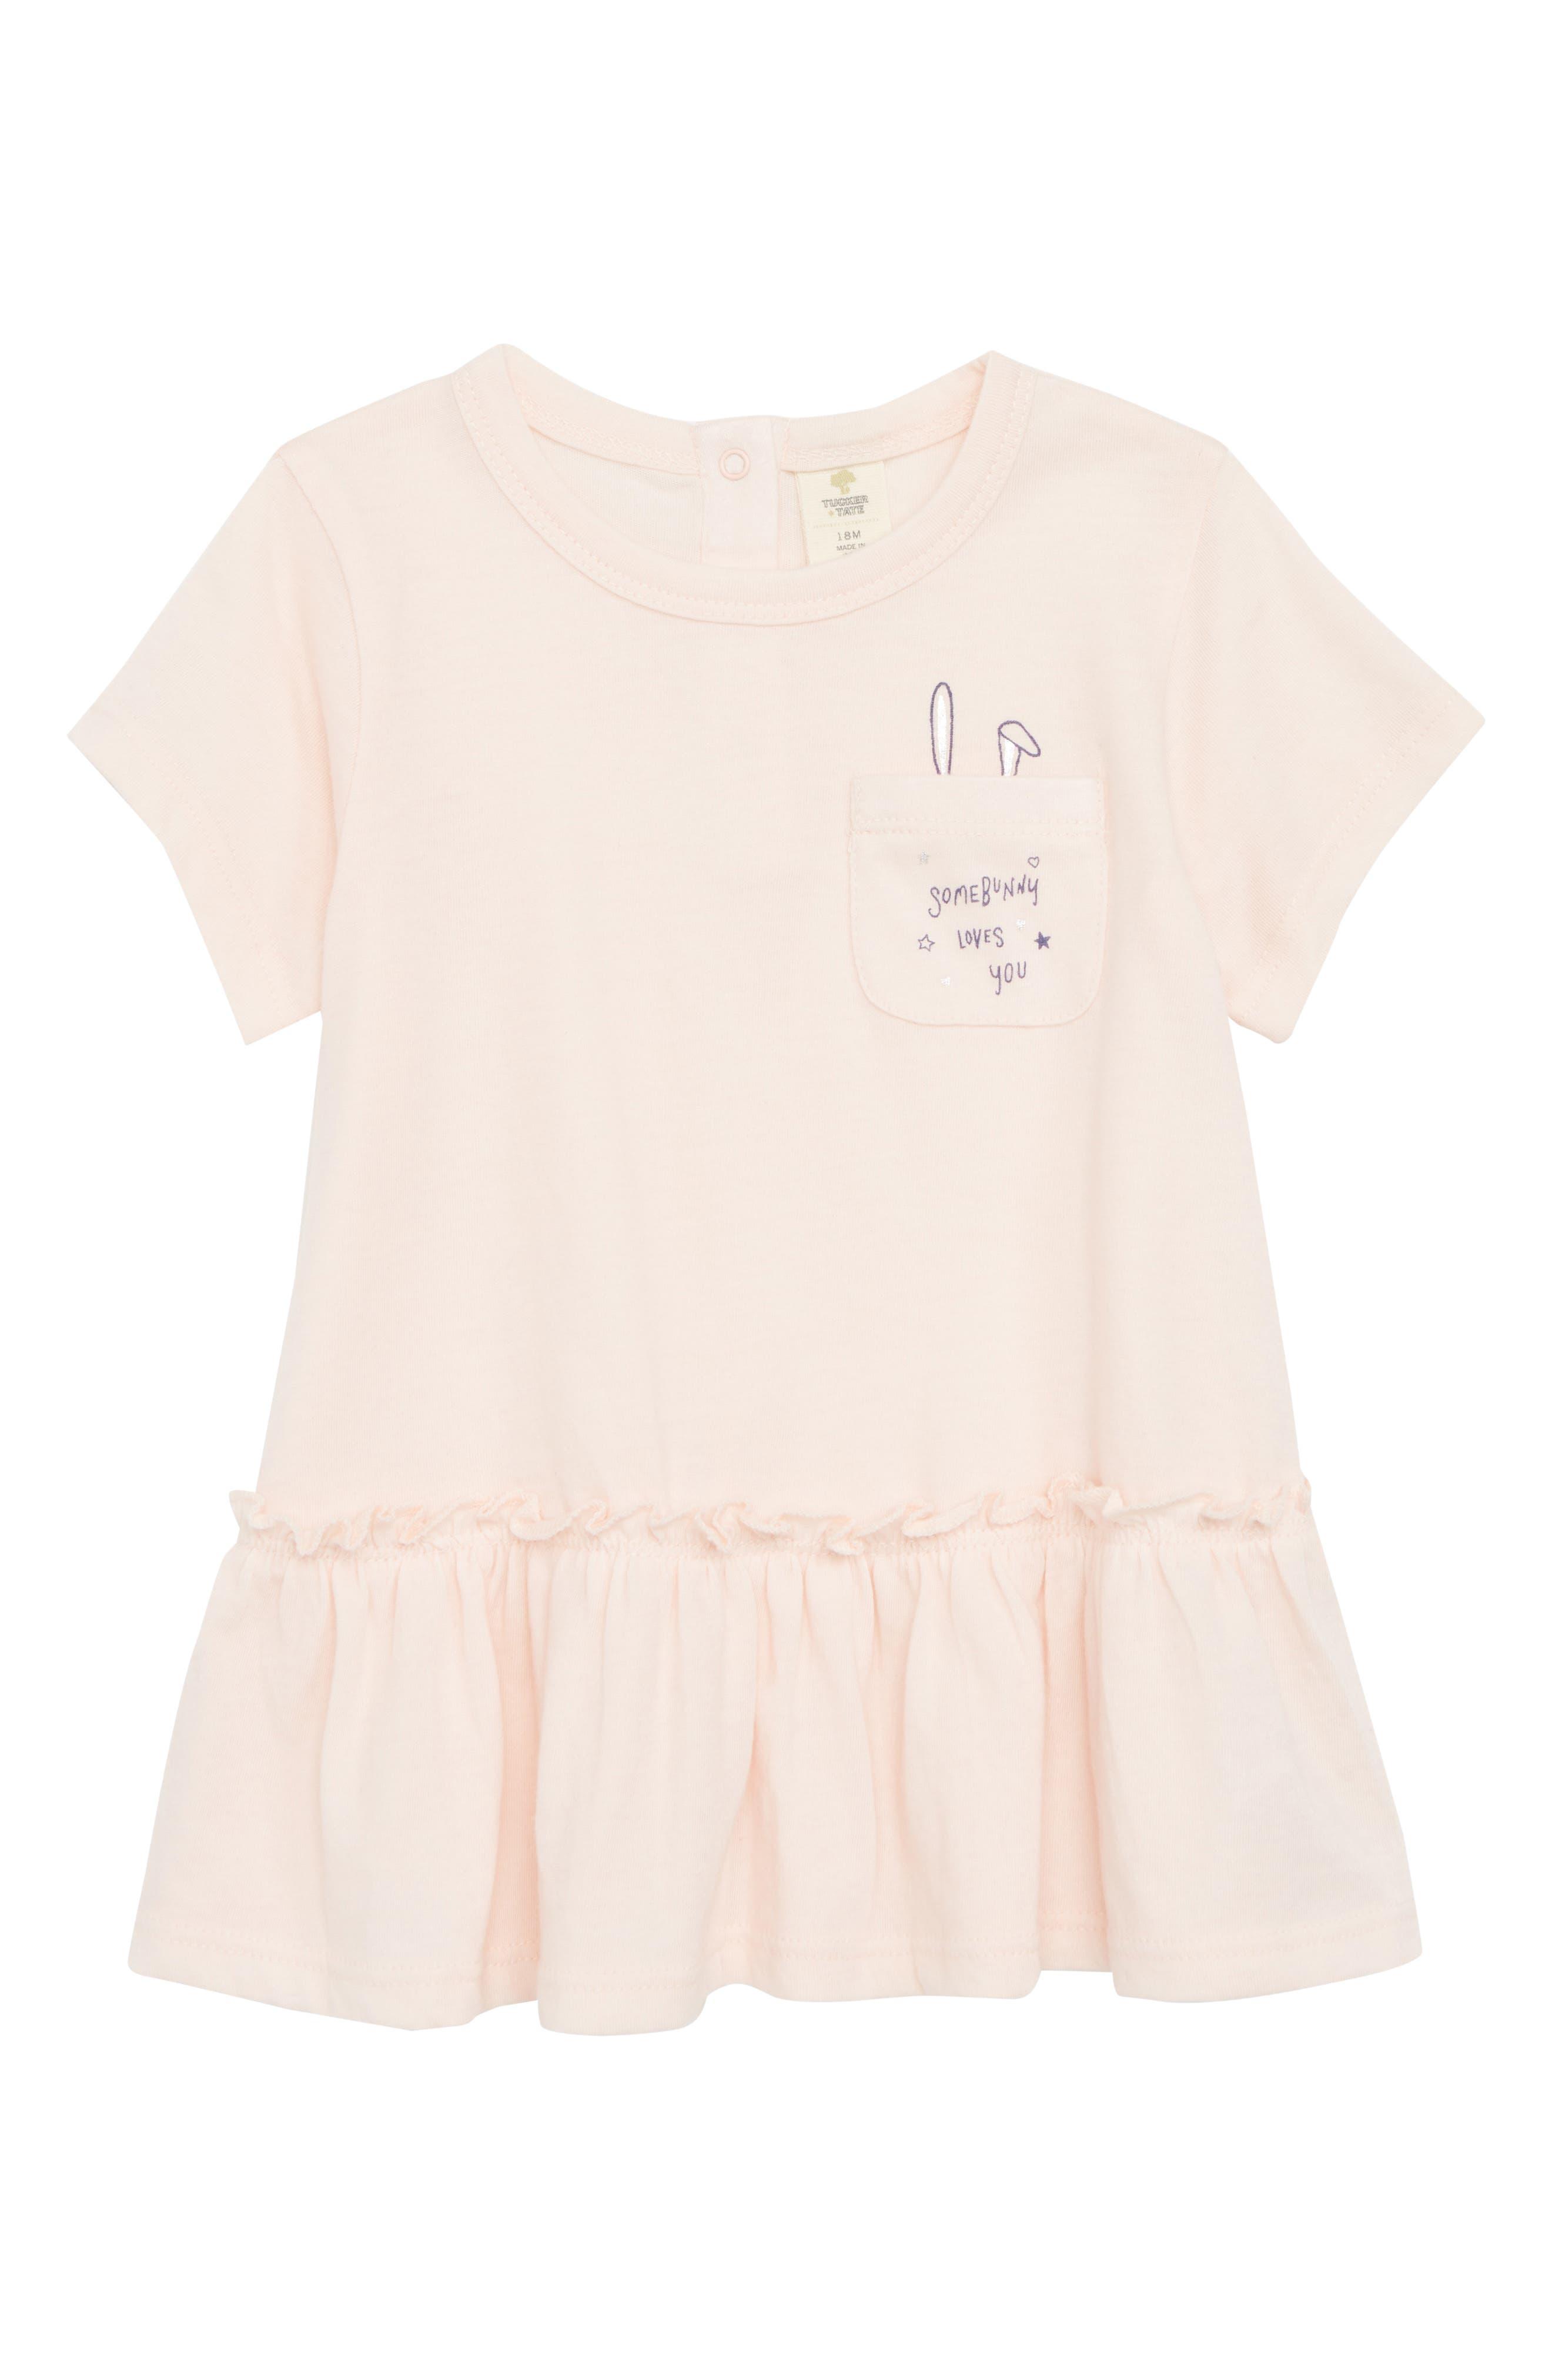 Peplum Graphic Tunic,                         Main,                         color, Pink Cloud Bunny Ears